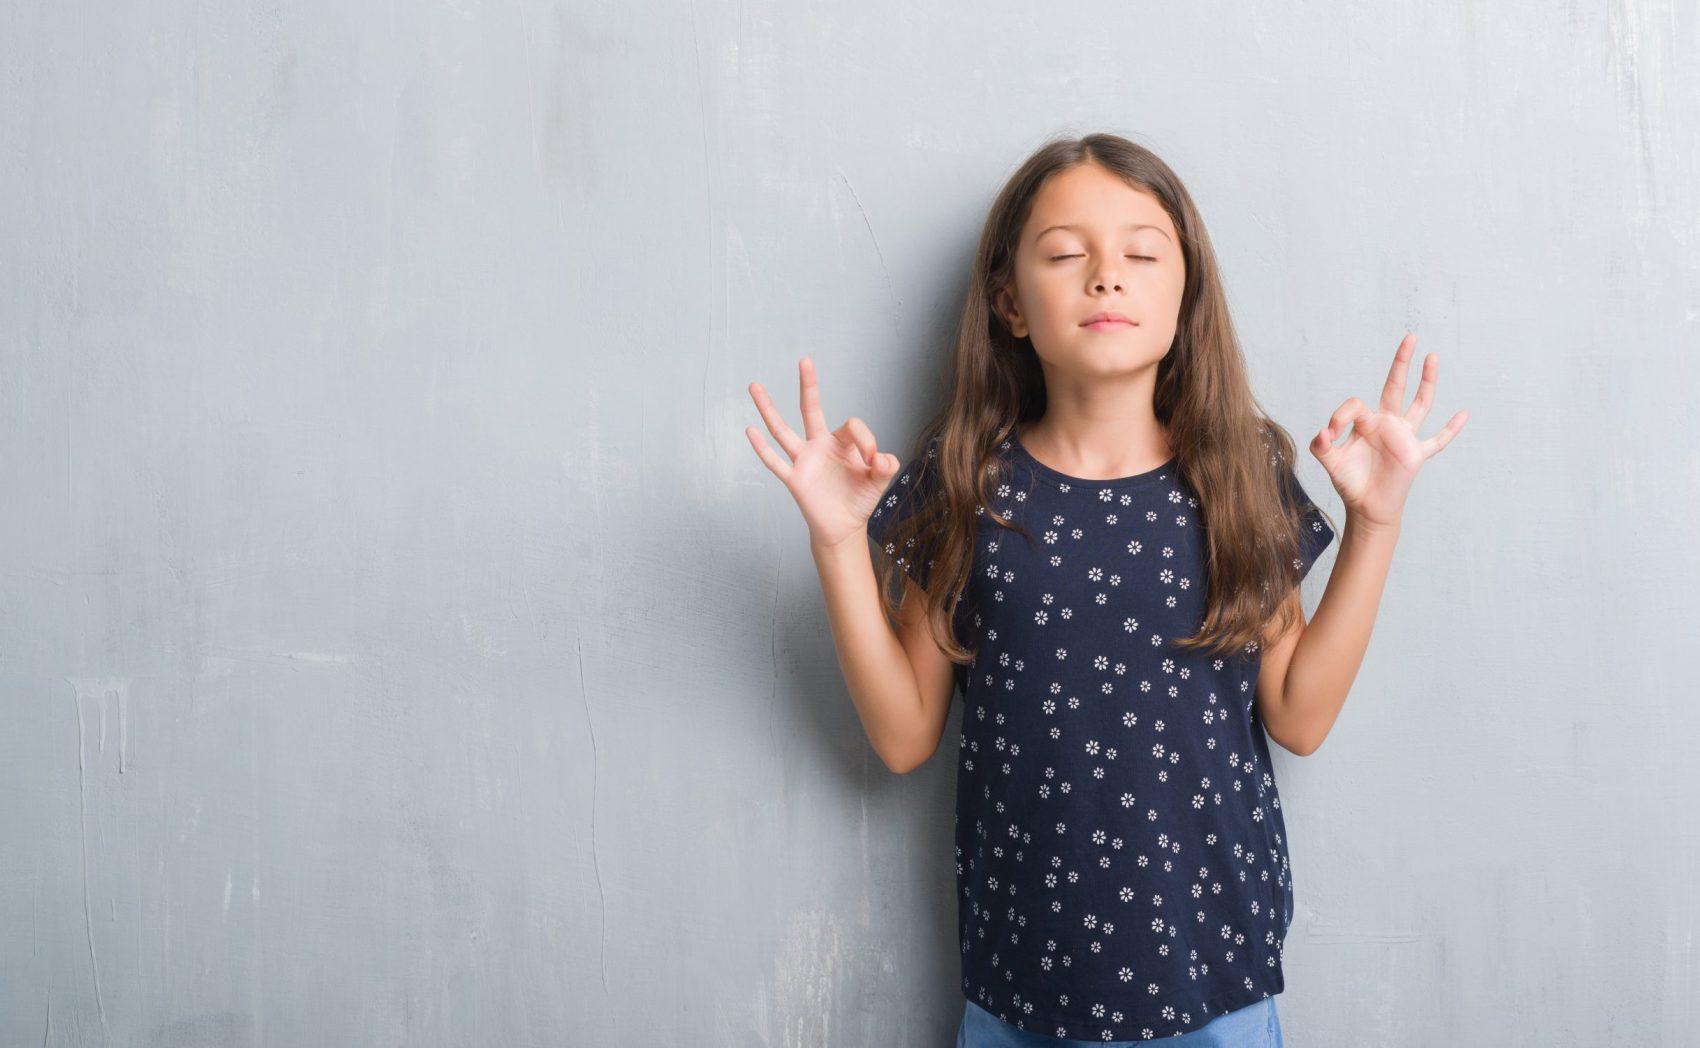 La_paz_interior_niña_practicando_midfulness